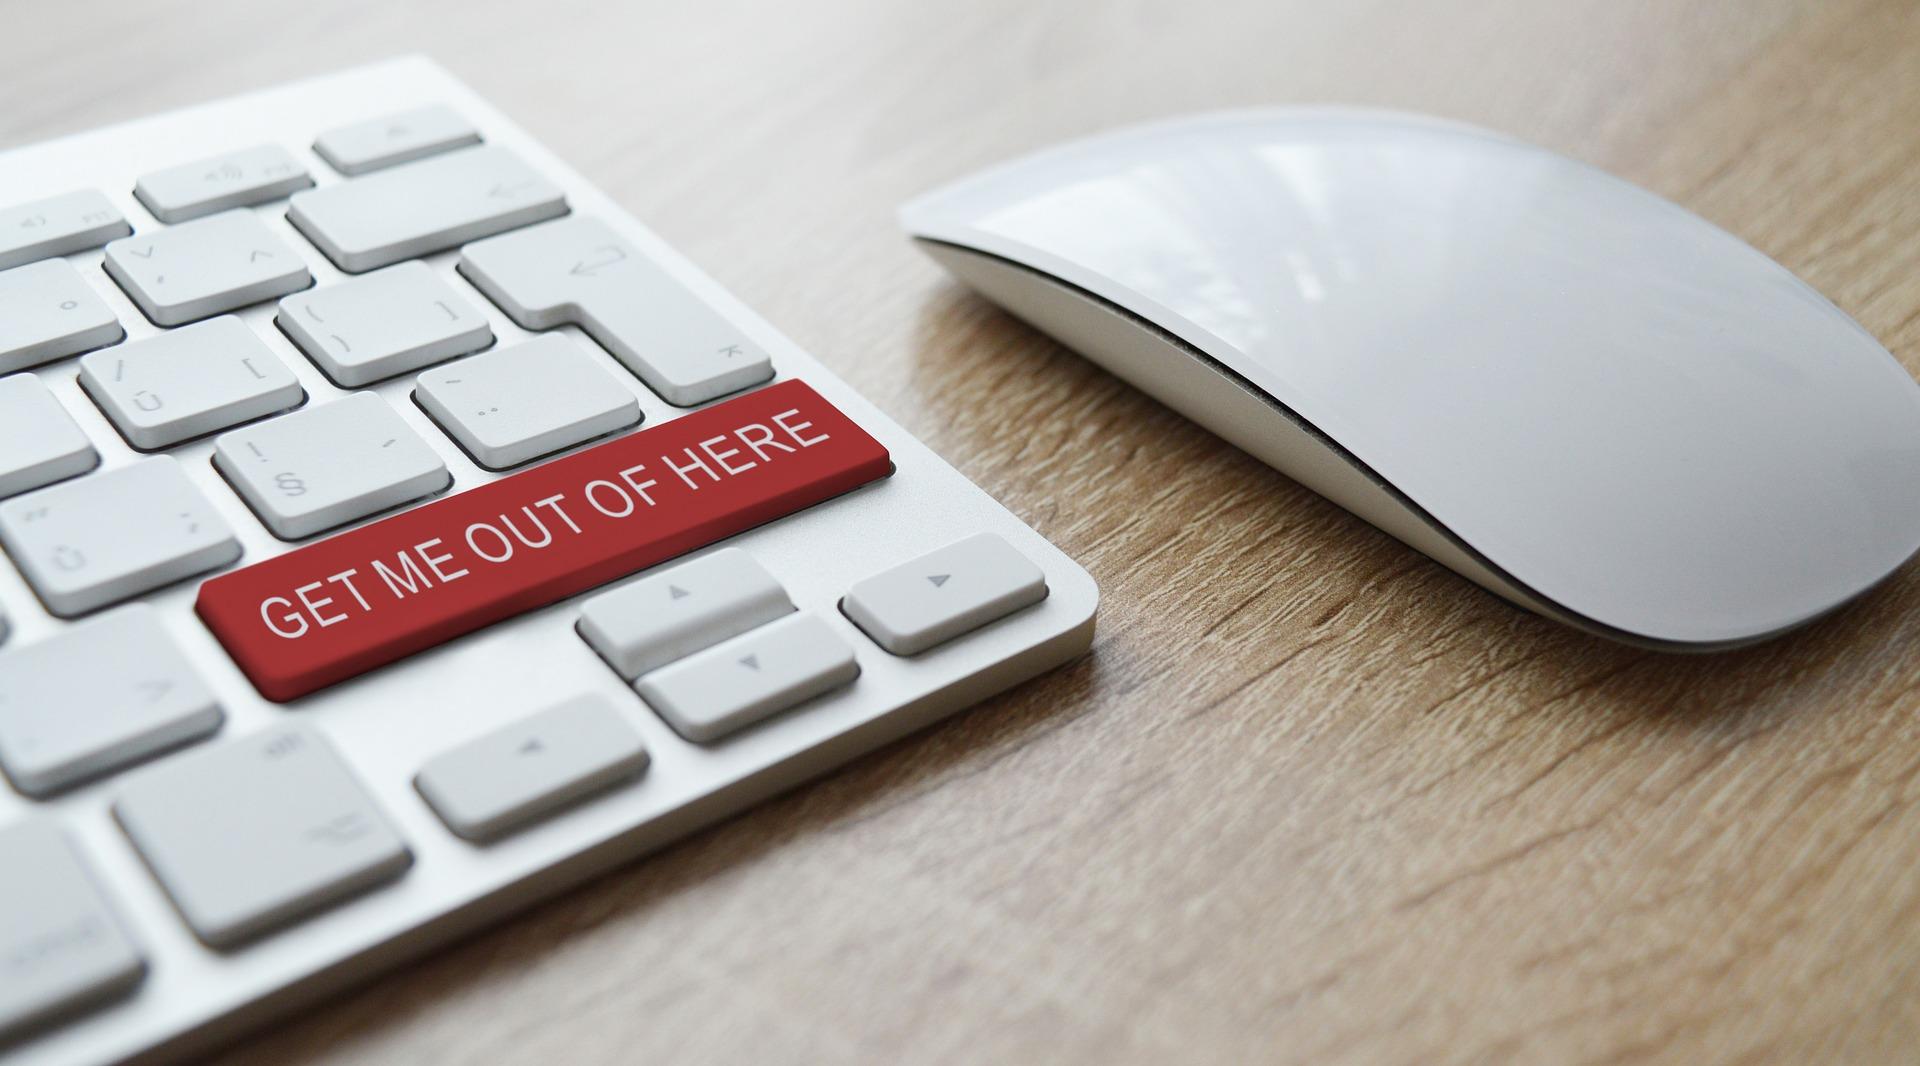 Is Dipsysweet a Scam or Untrustworthy Online Shop?